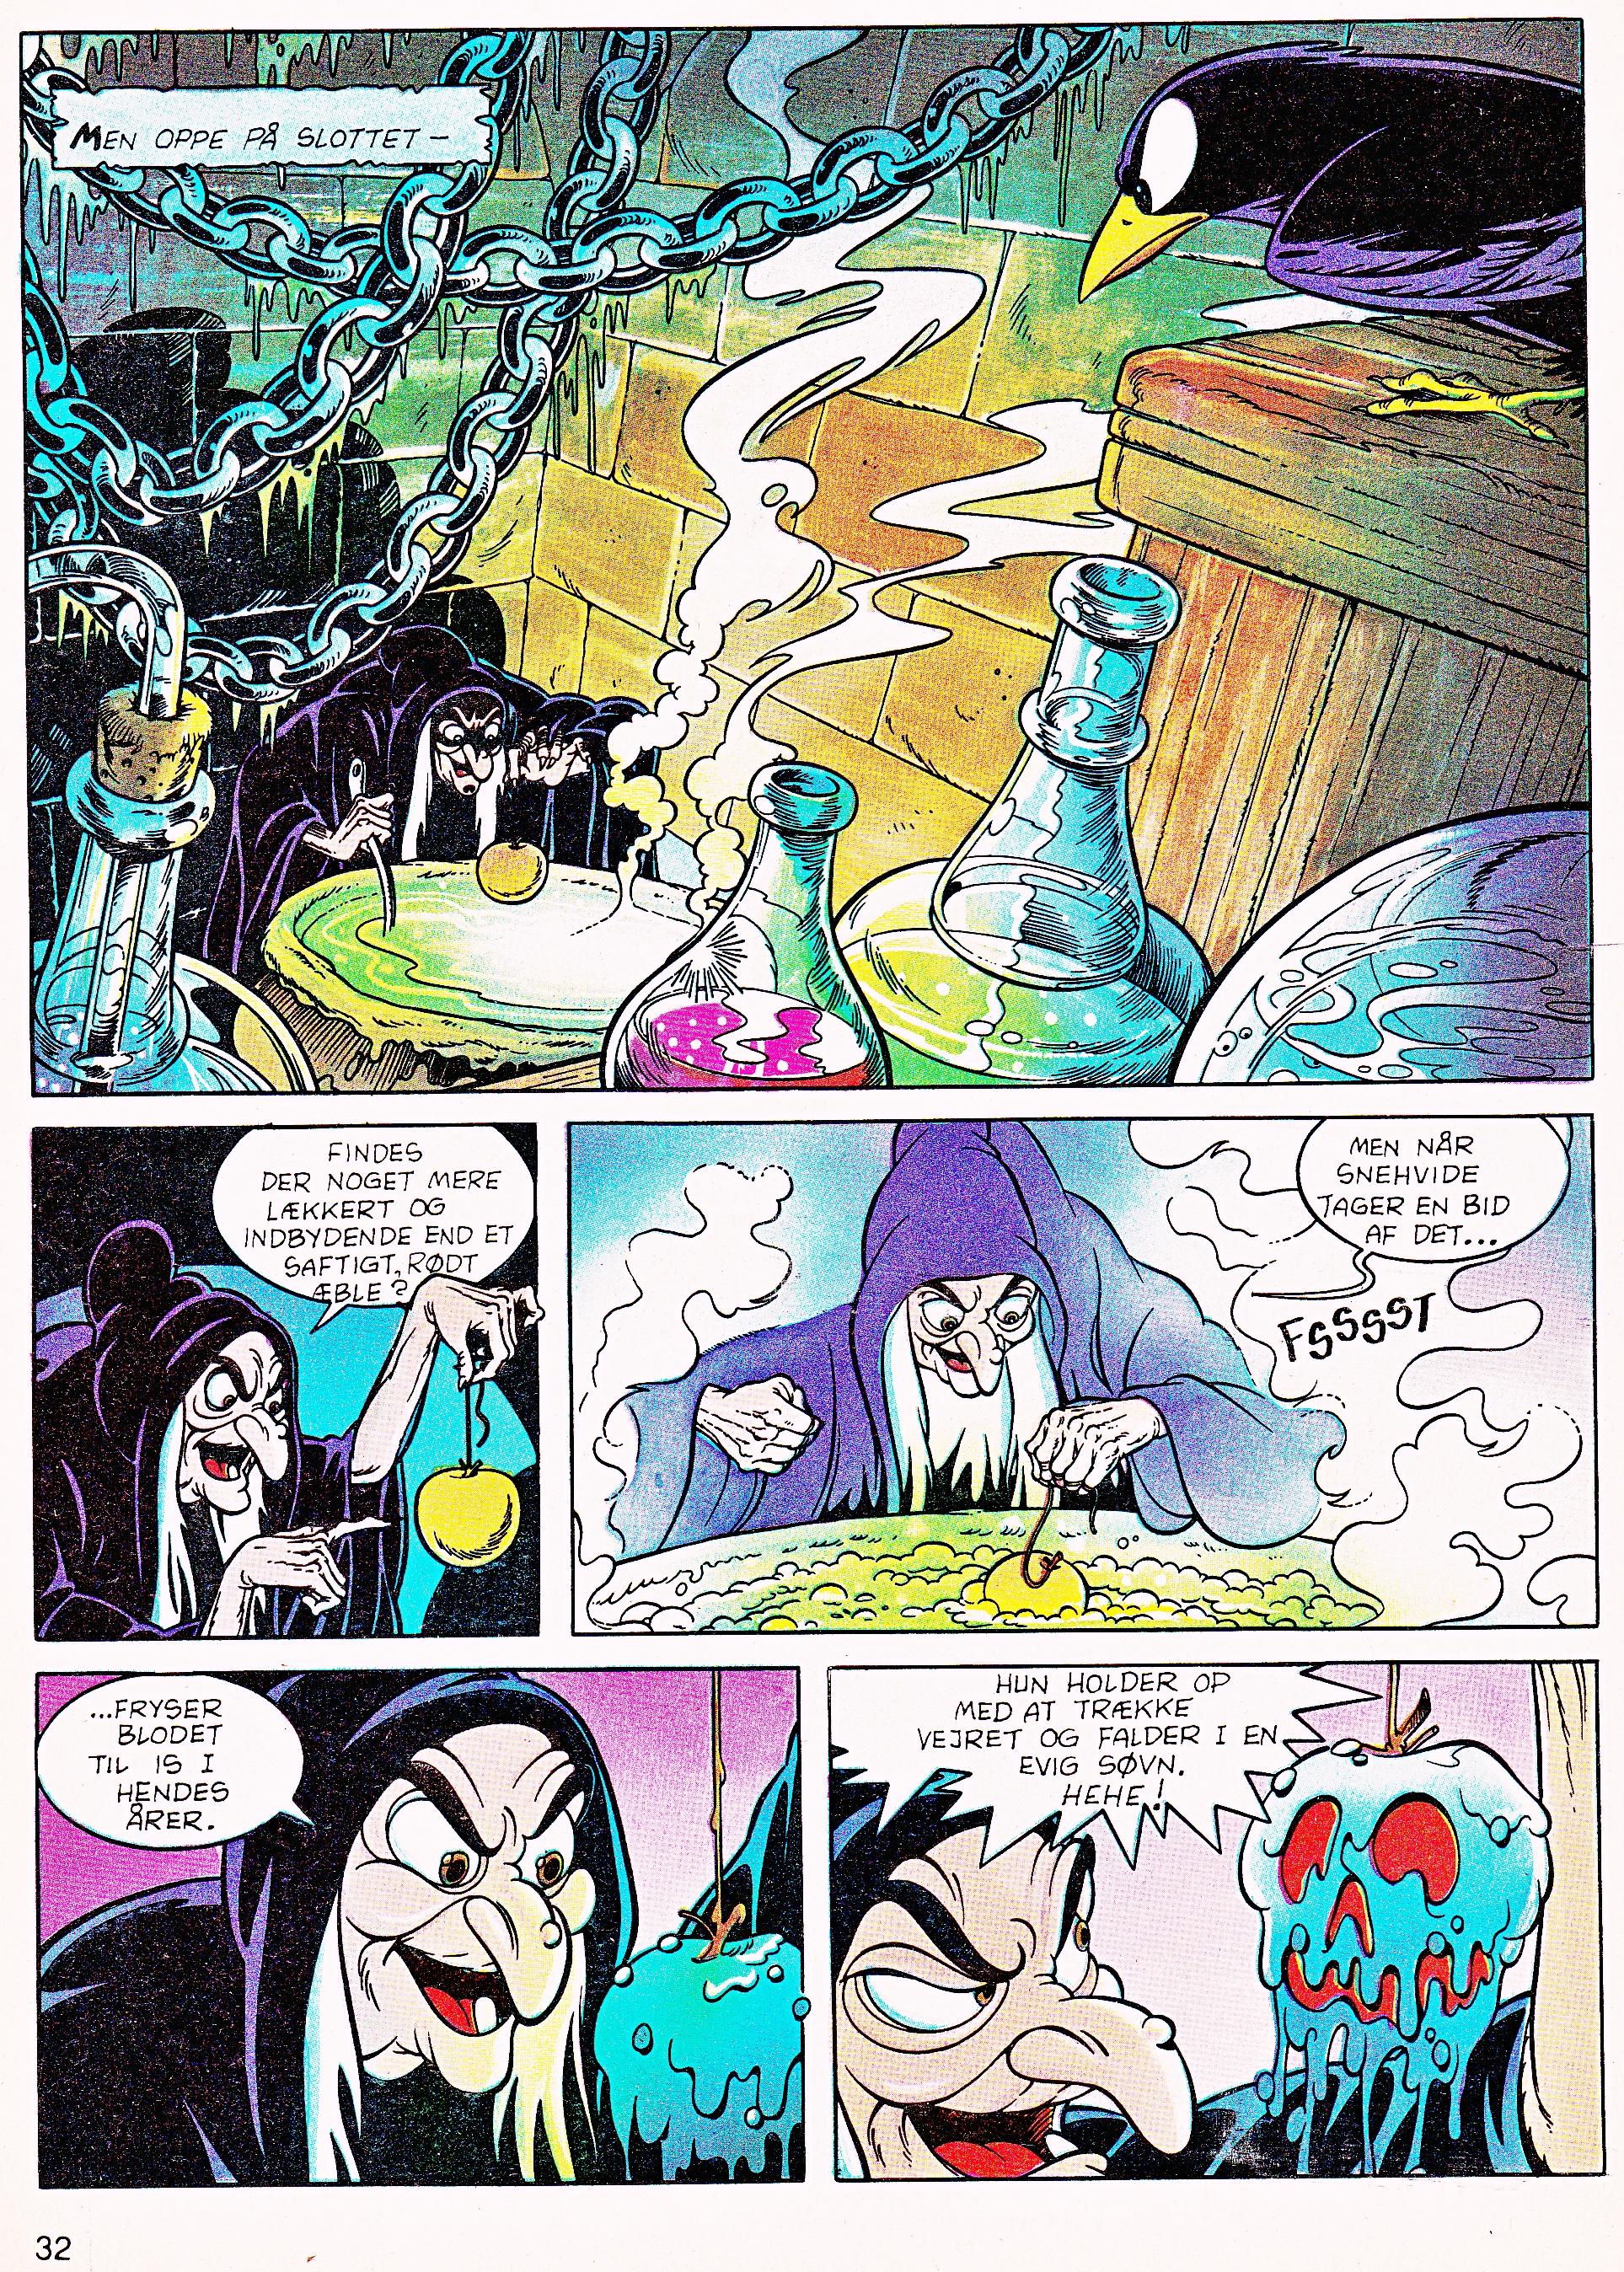 Walt Disney Movie Comics - Snow White and the Seven Dwarfs (Danish 1992 Version)